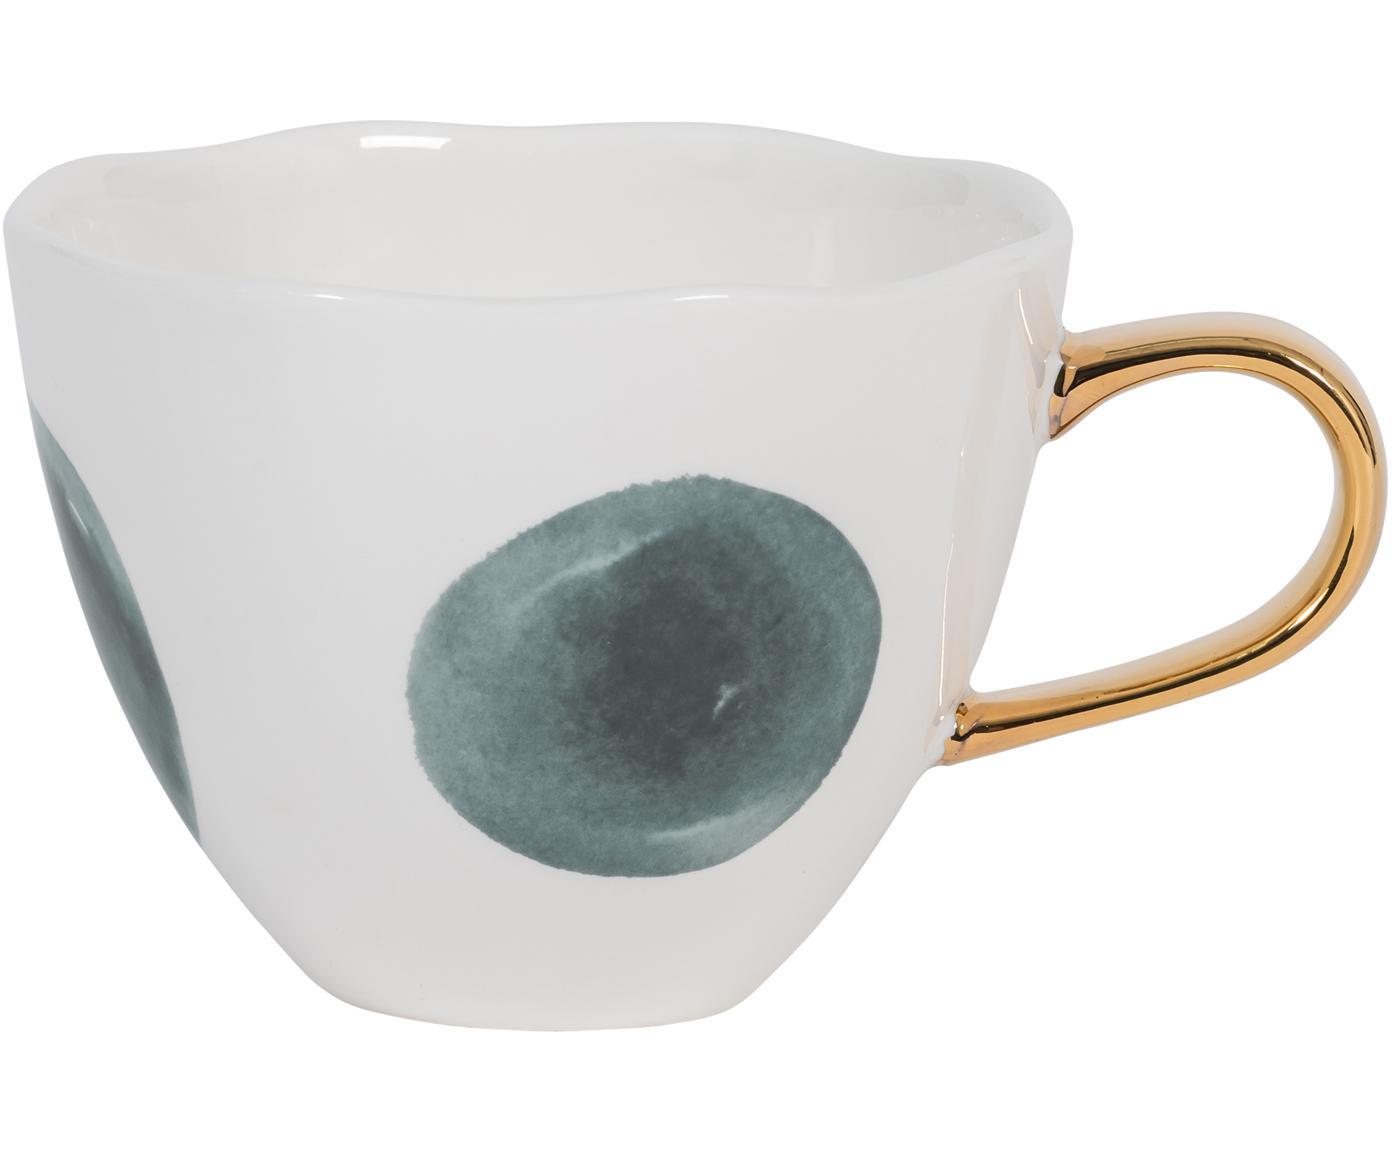 Taza Good Morning, Gres, Blanco, azul, Ø 11 x Al 8 cm